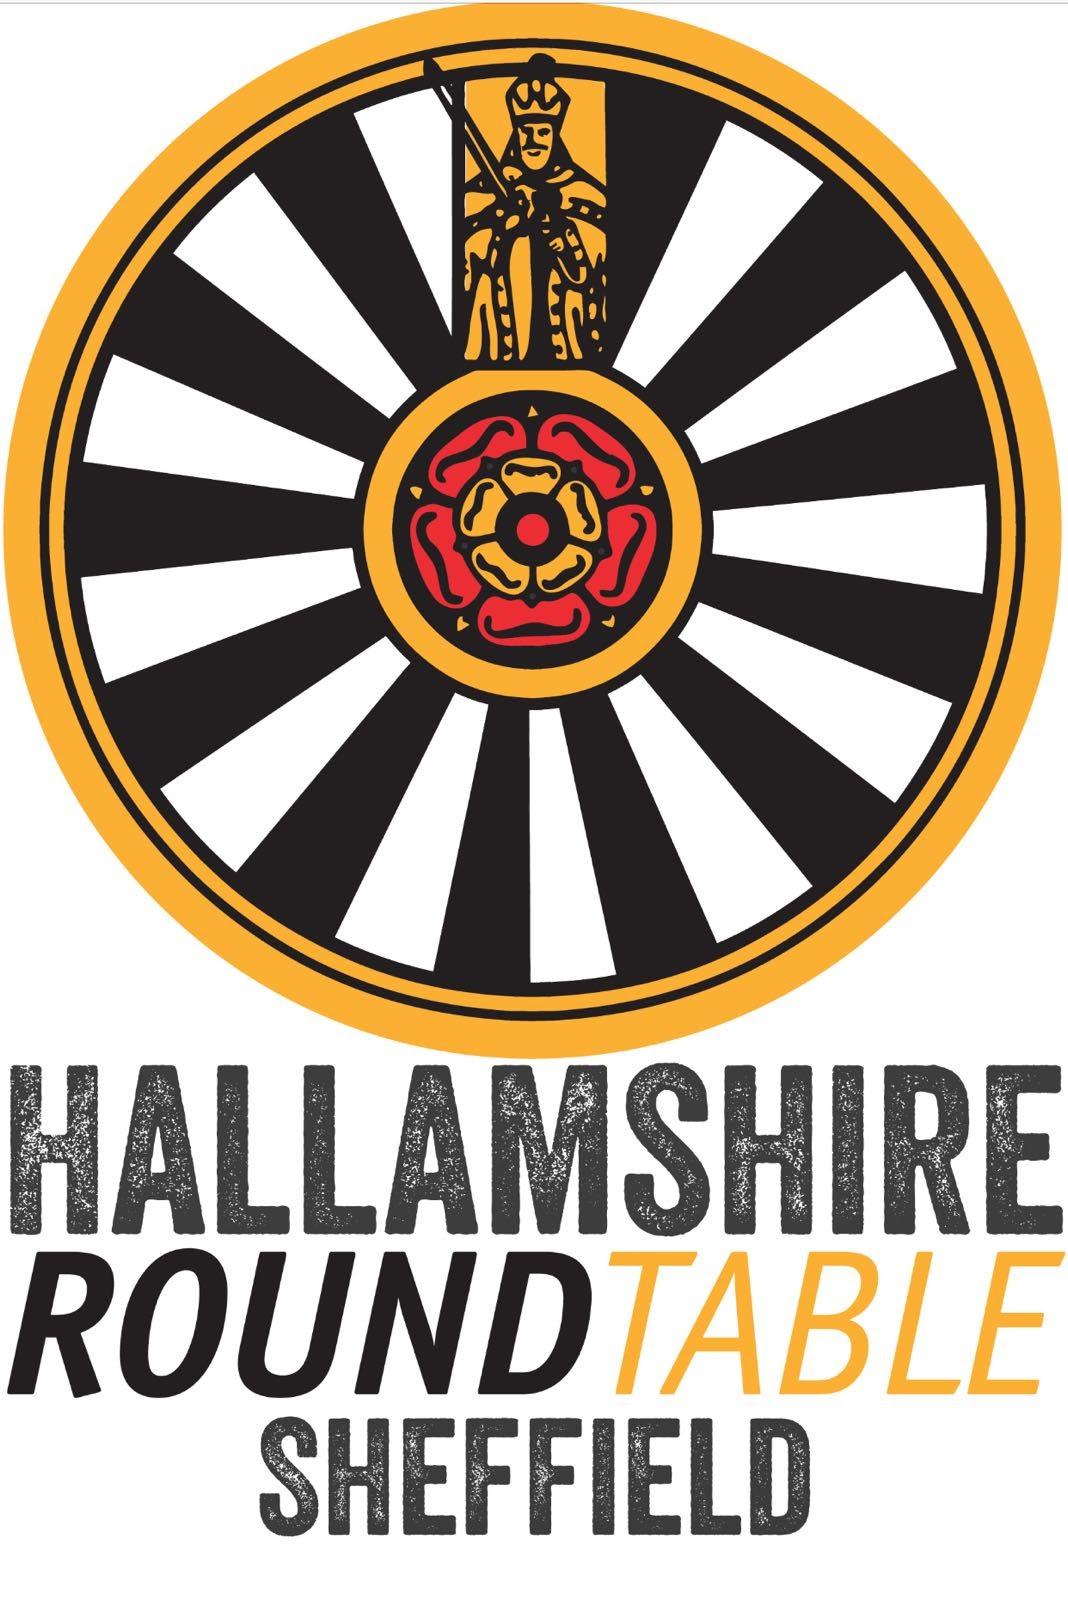 Hallumshire Round Table